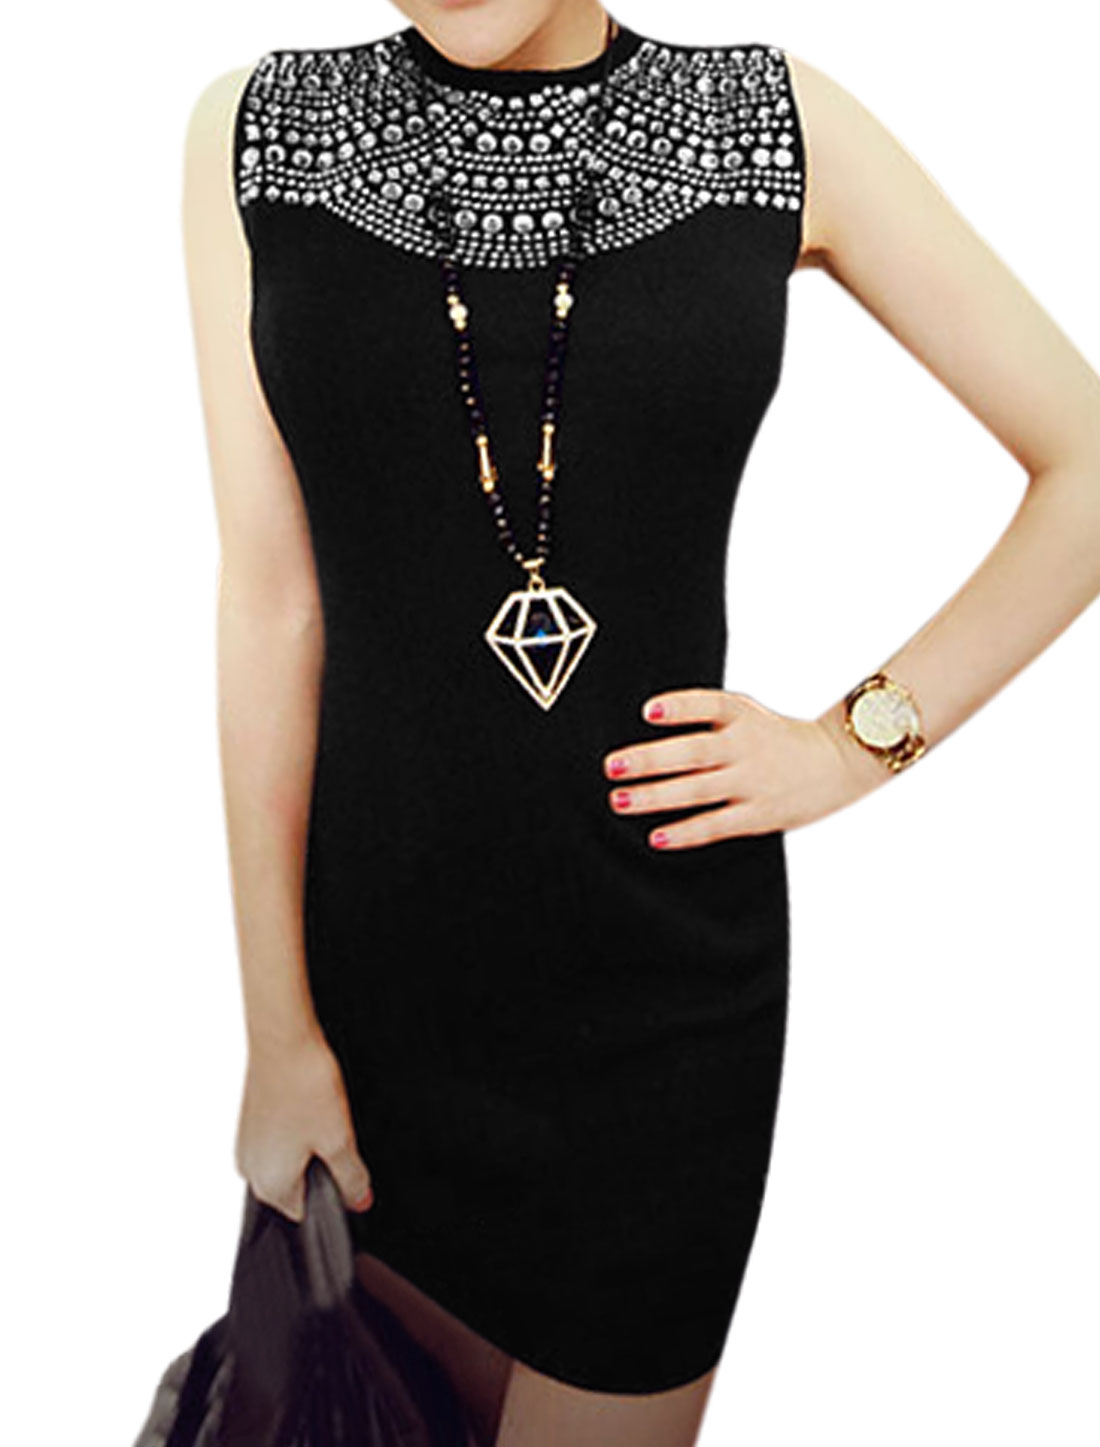 Ladies Black Rhinestones Embellished Zipper Back Sleeveless Dress S